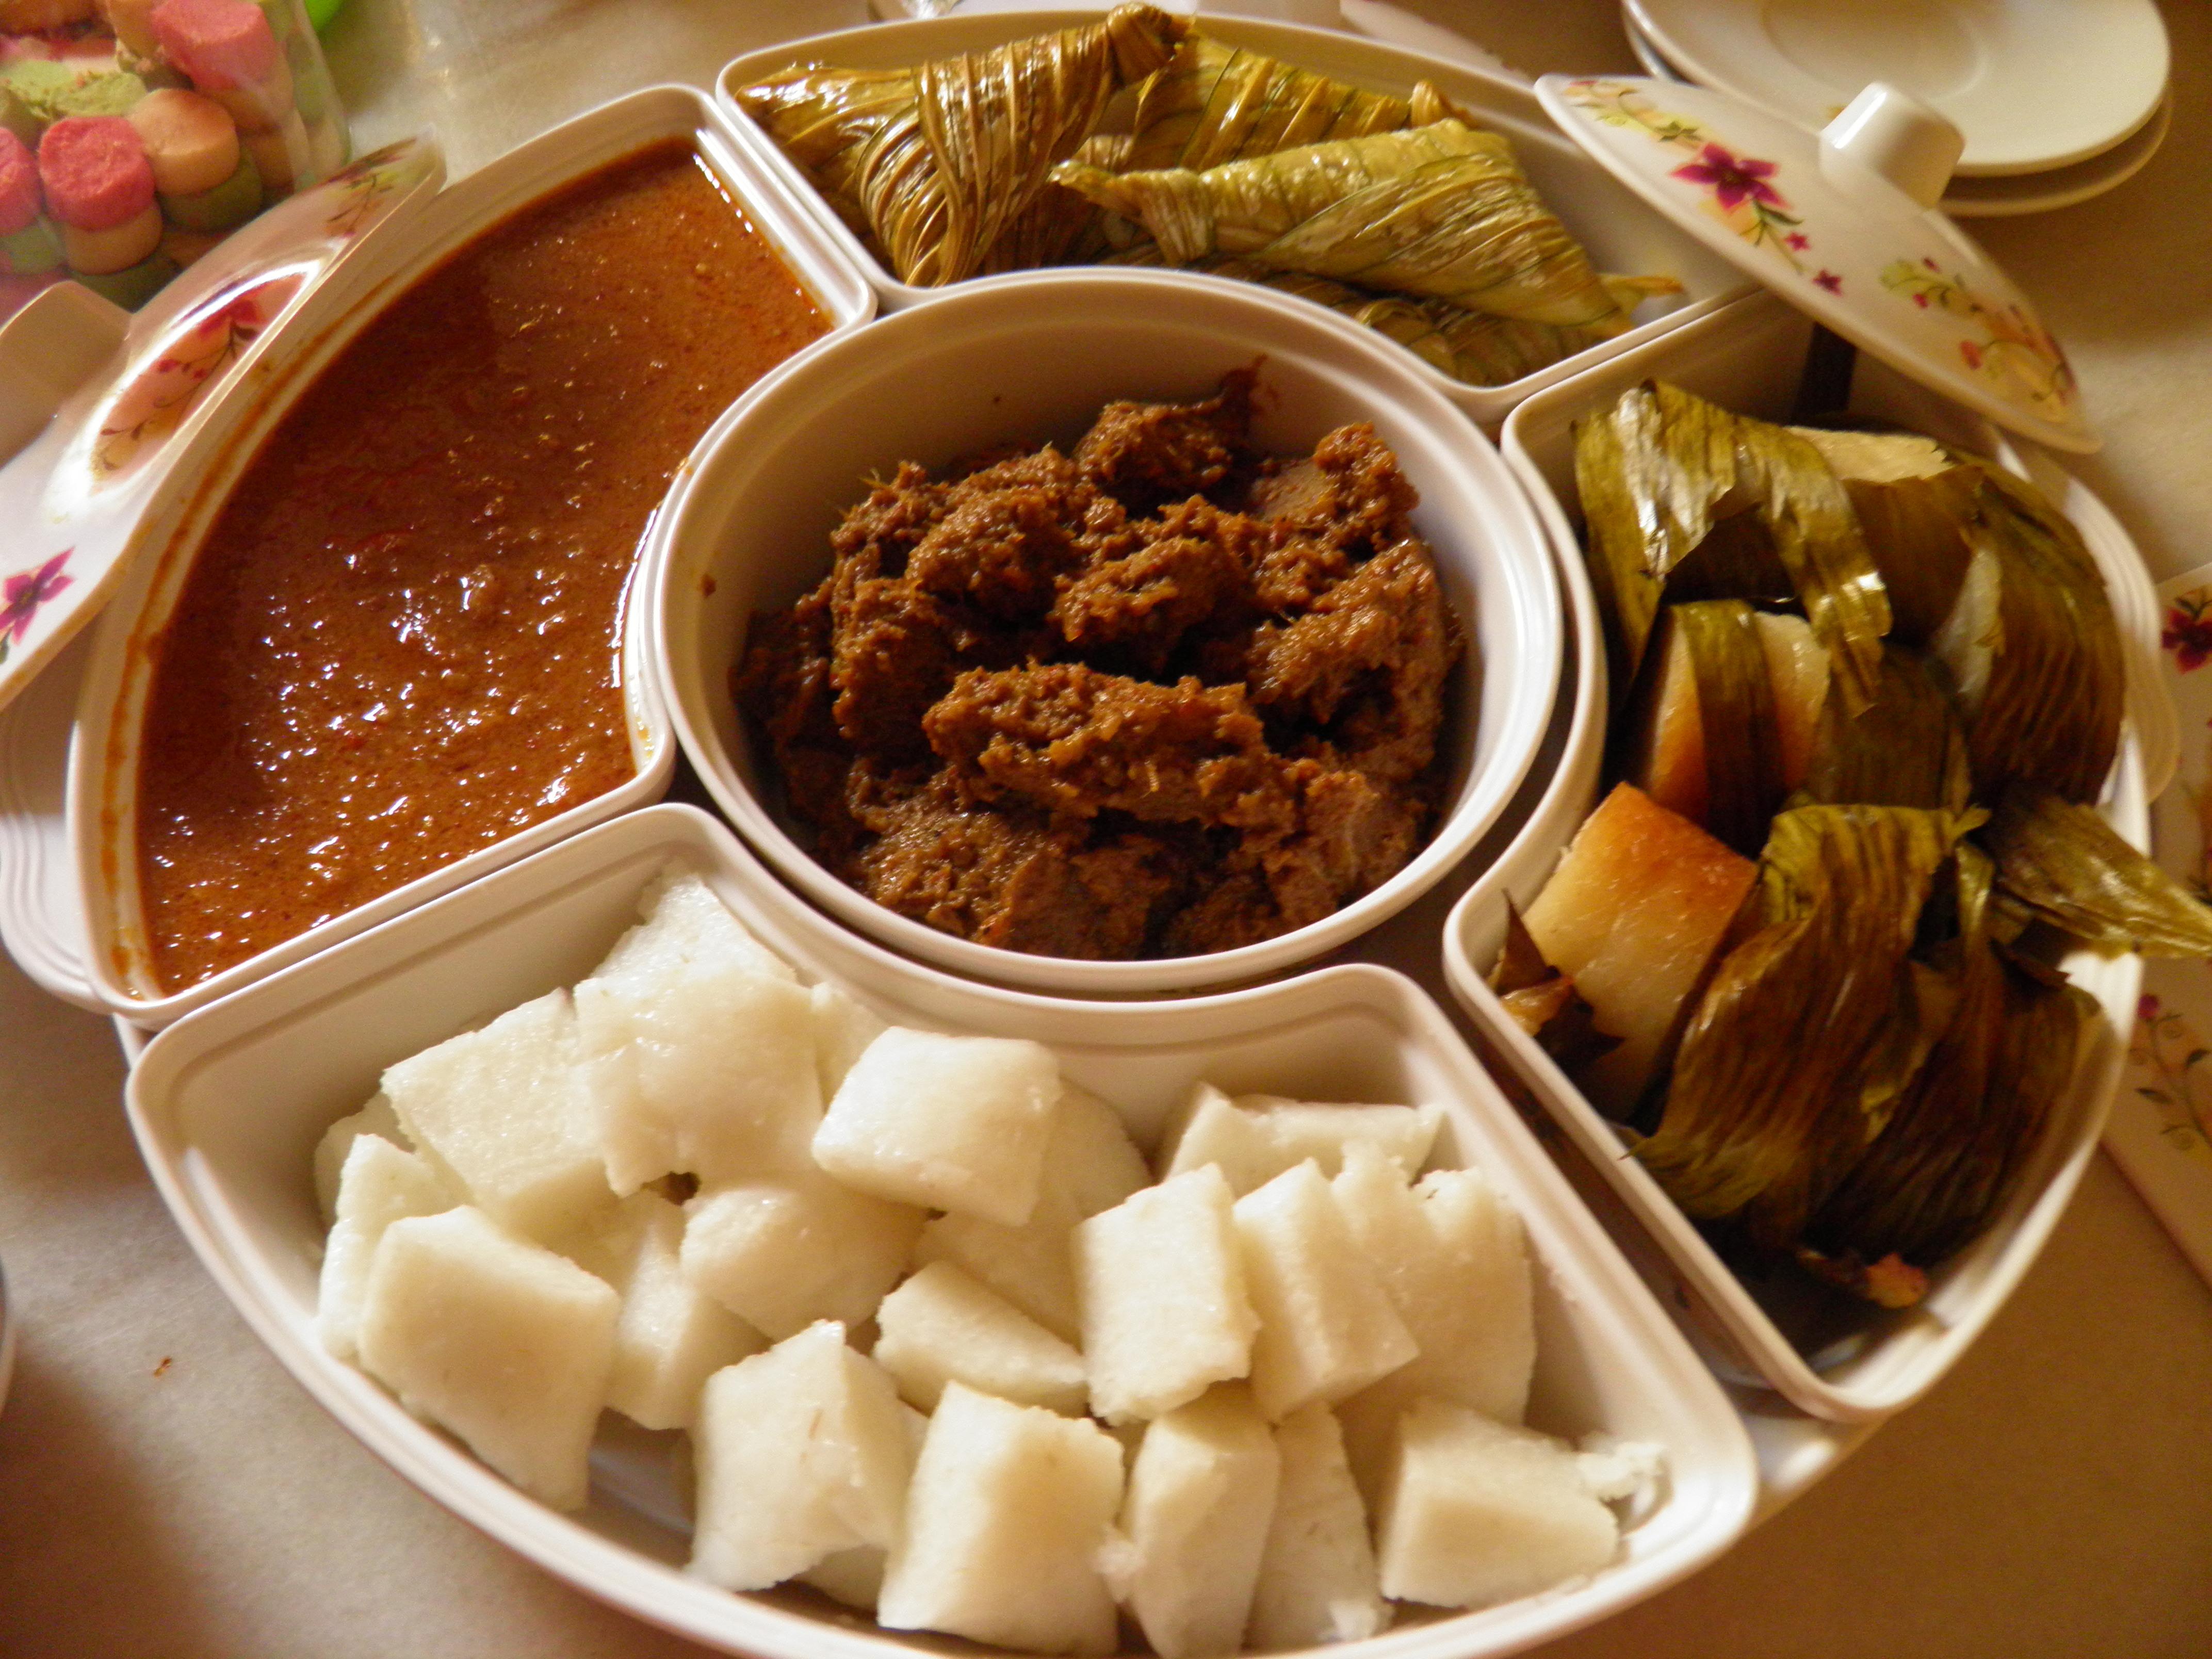 Download Hari Raya Eid Al-Fitr Food - Hari-Raya-Food-Credit-to-One-Way-Ticket-Msia  Pic_926239 .jpg